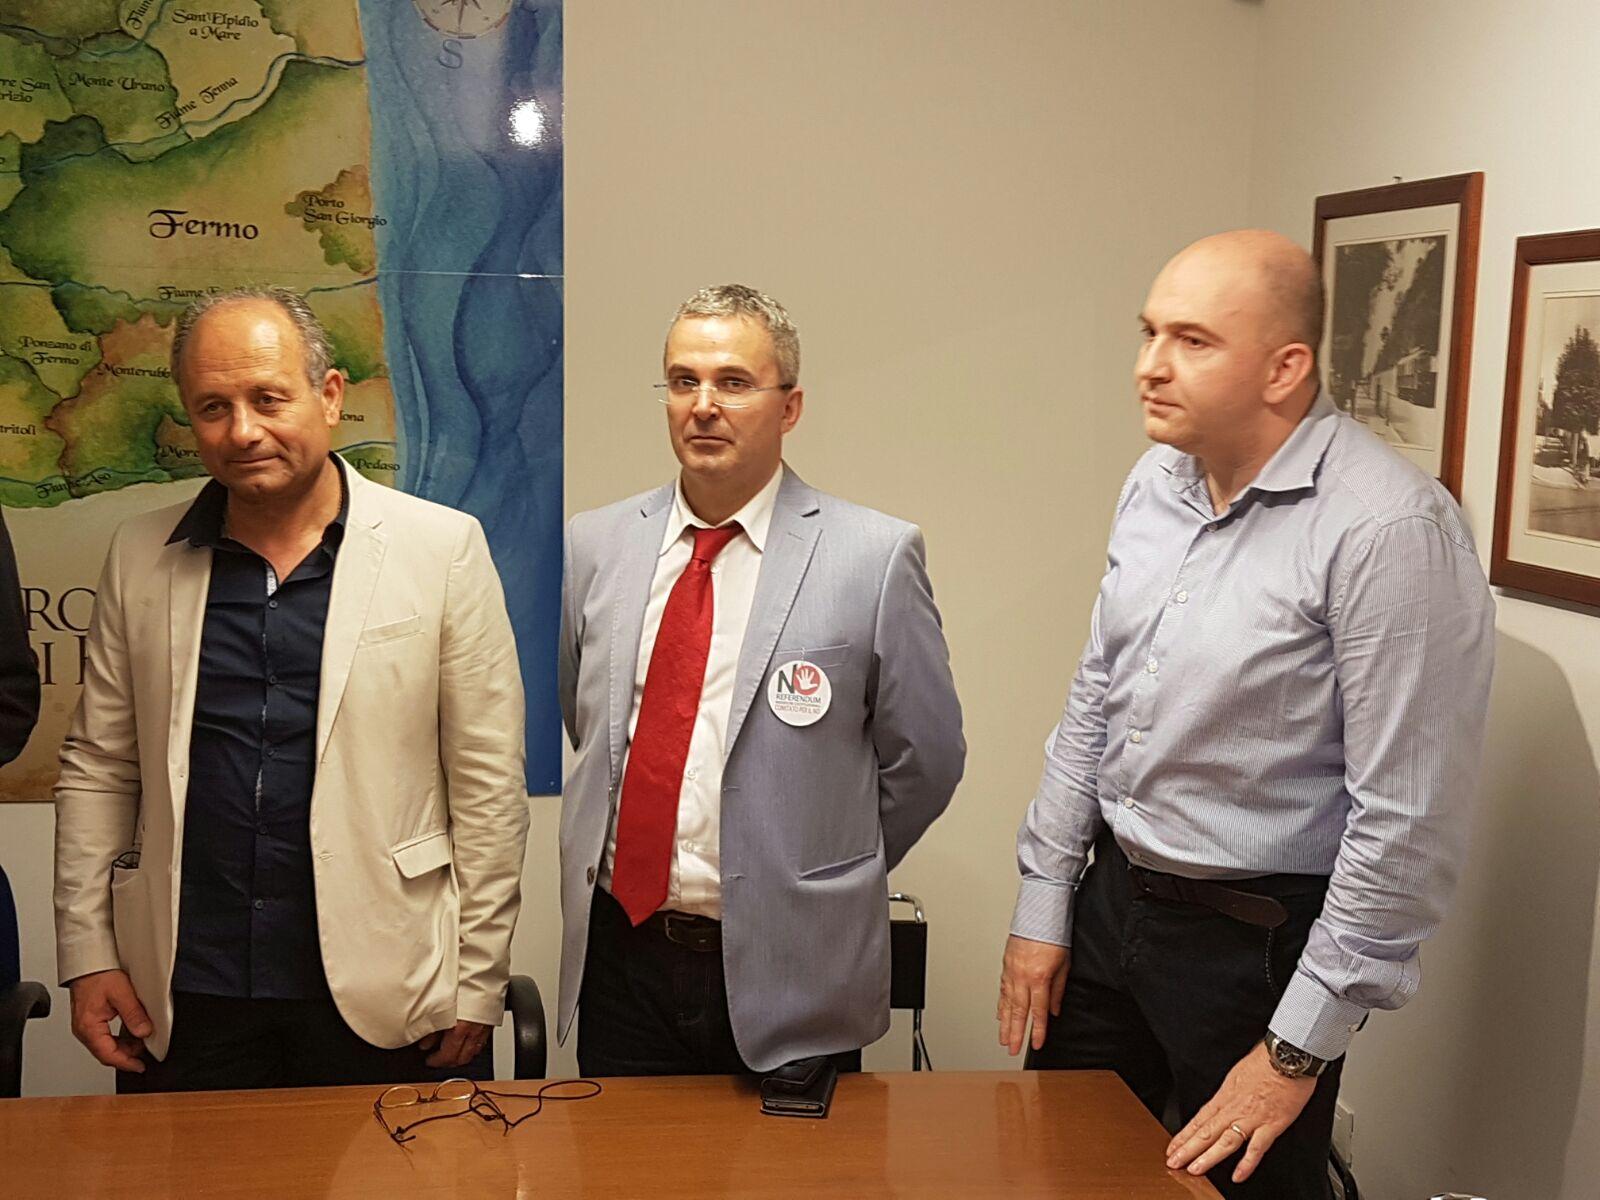 L'assessore Febi, Renzo Interlenghi ed Emanuele Corradi